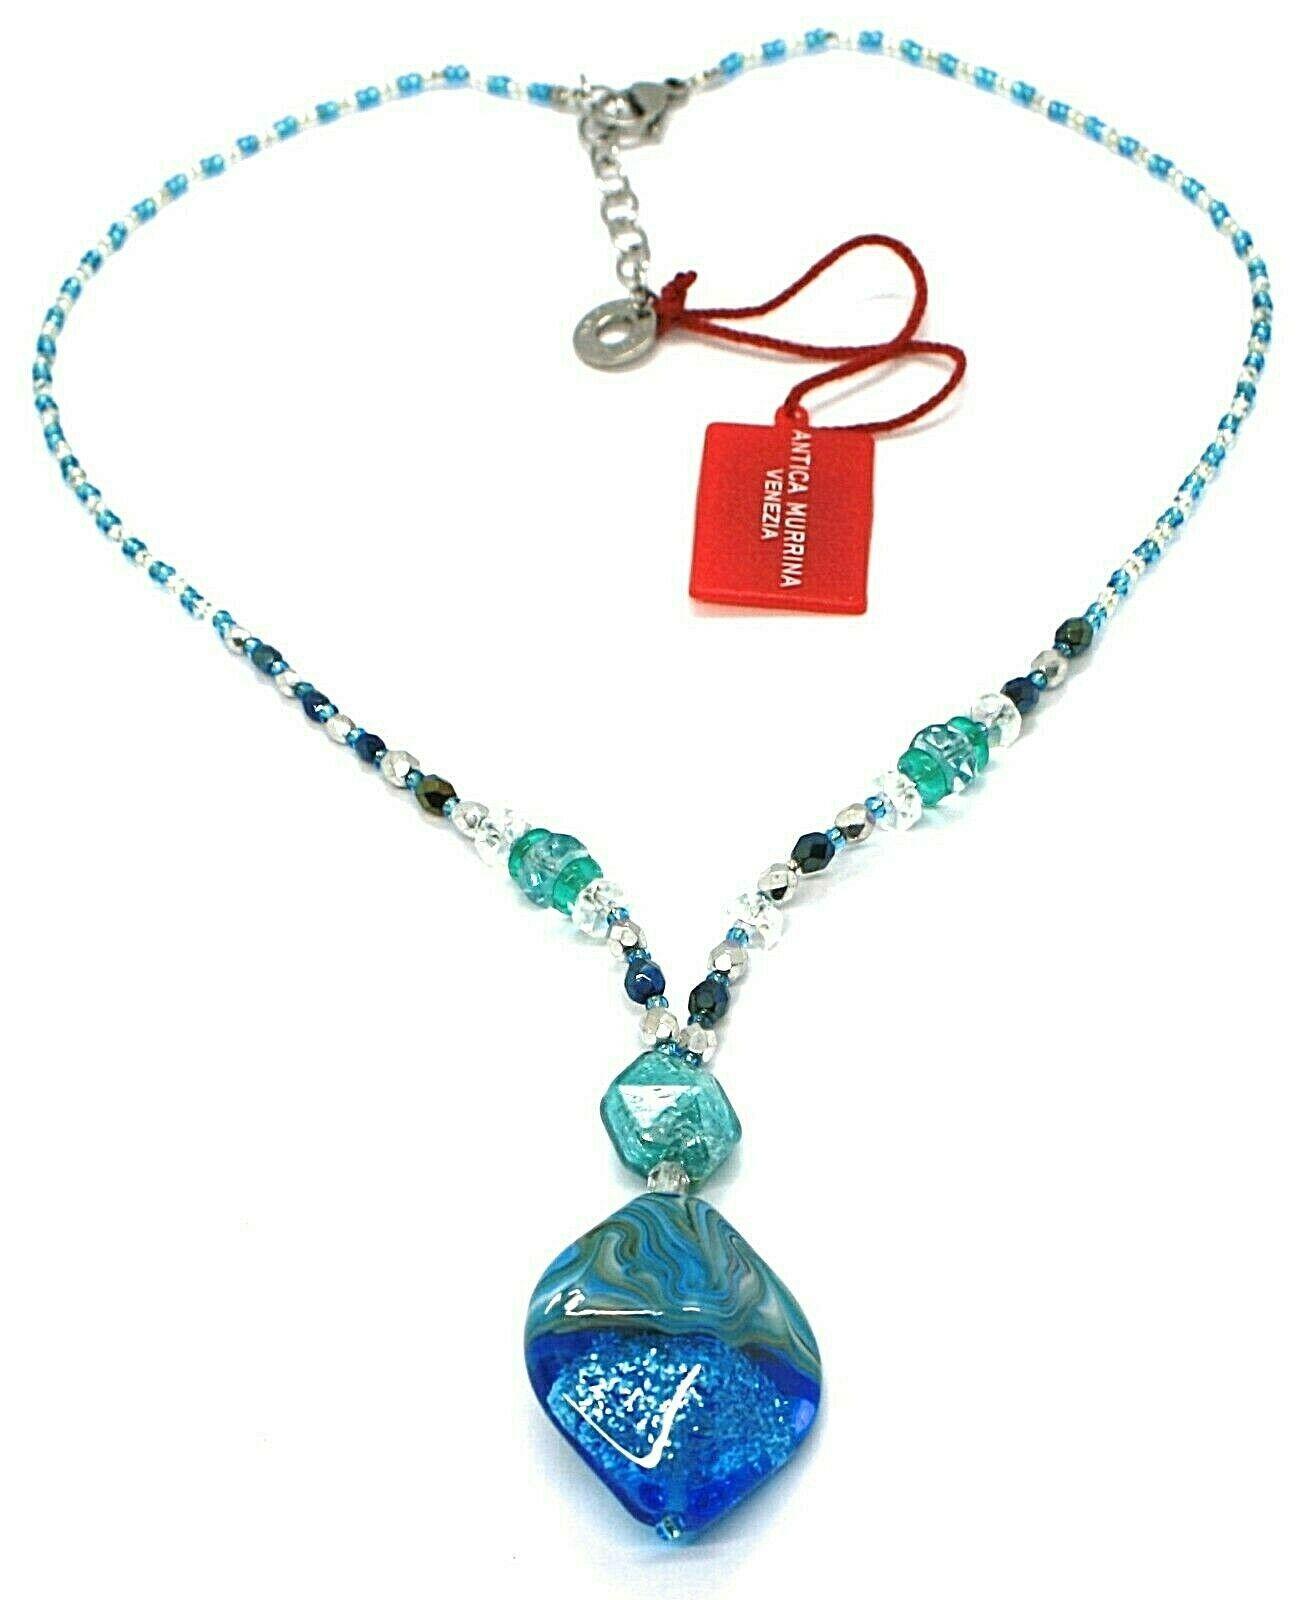 Necklace Antica Murrina Venezia, 45 cm, CO863A07, Pendant Blue Glitter Stripe